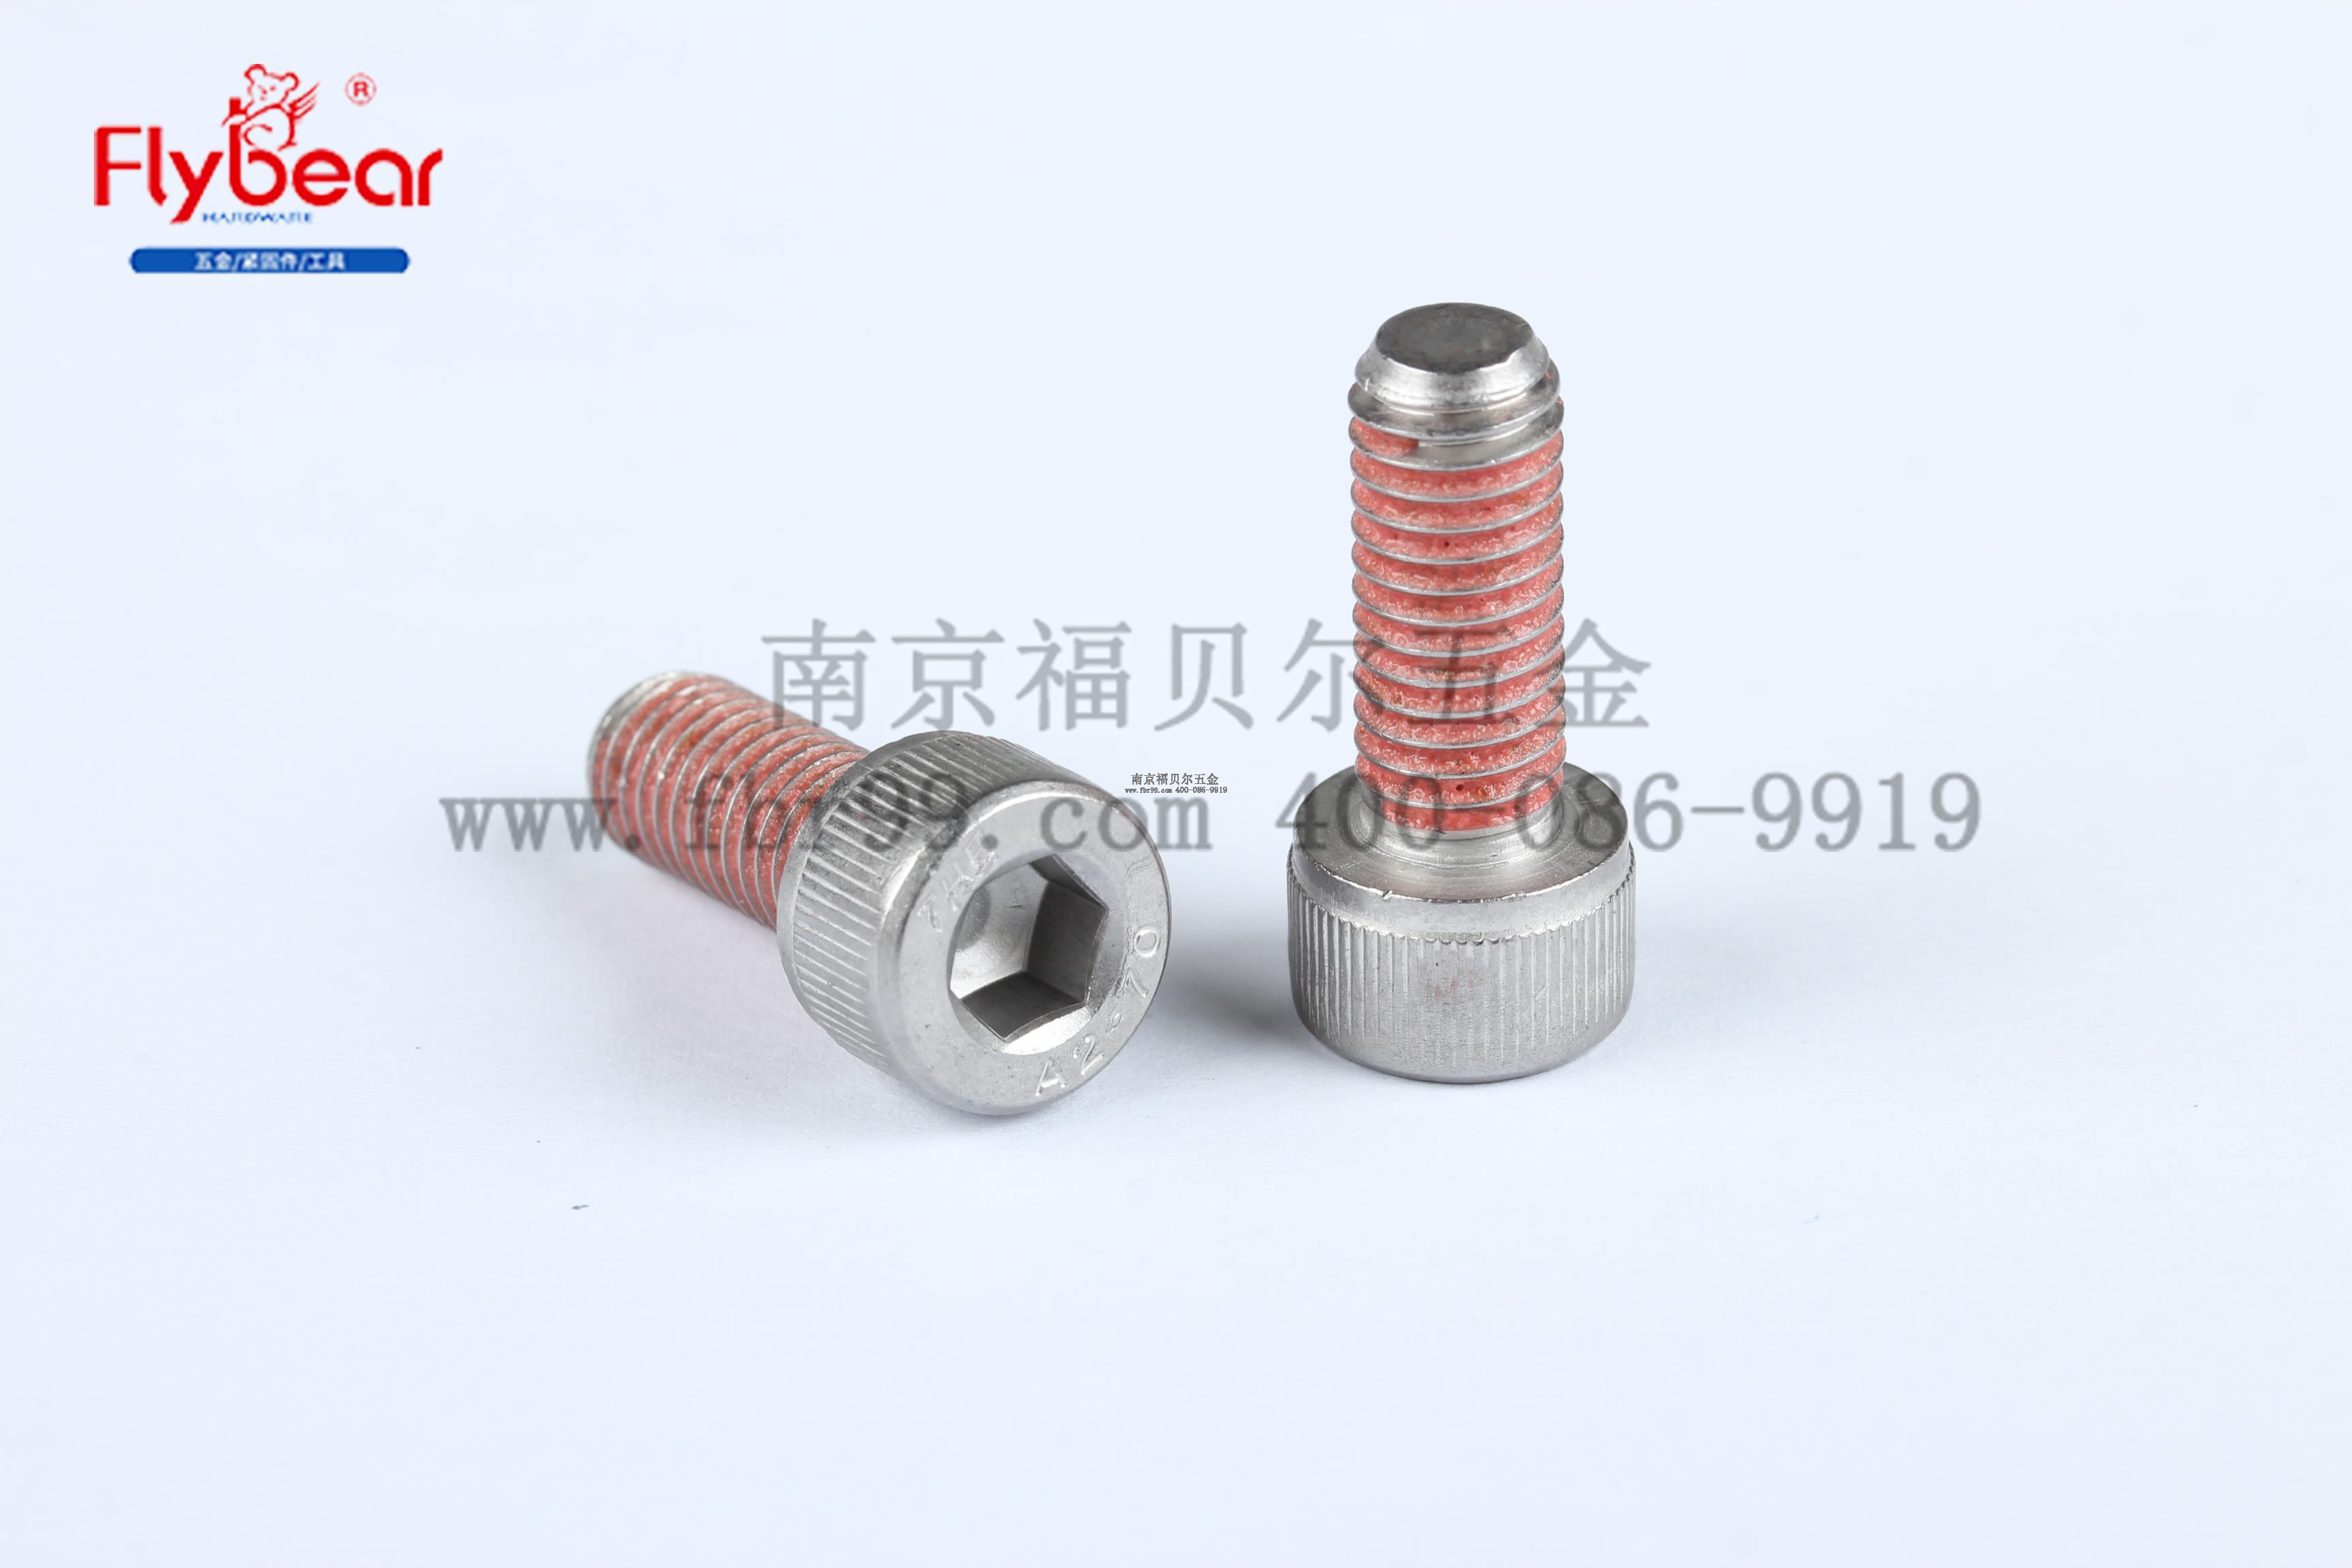 DIN912 内六角圆柱头全牙螺栓 304 不锈钢A2-70 driloc 涂胶